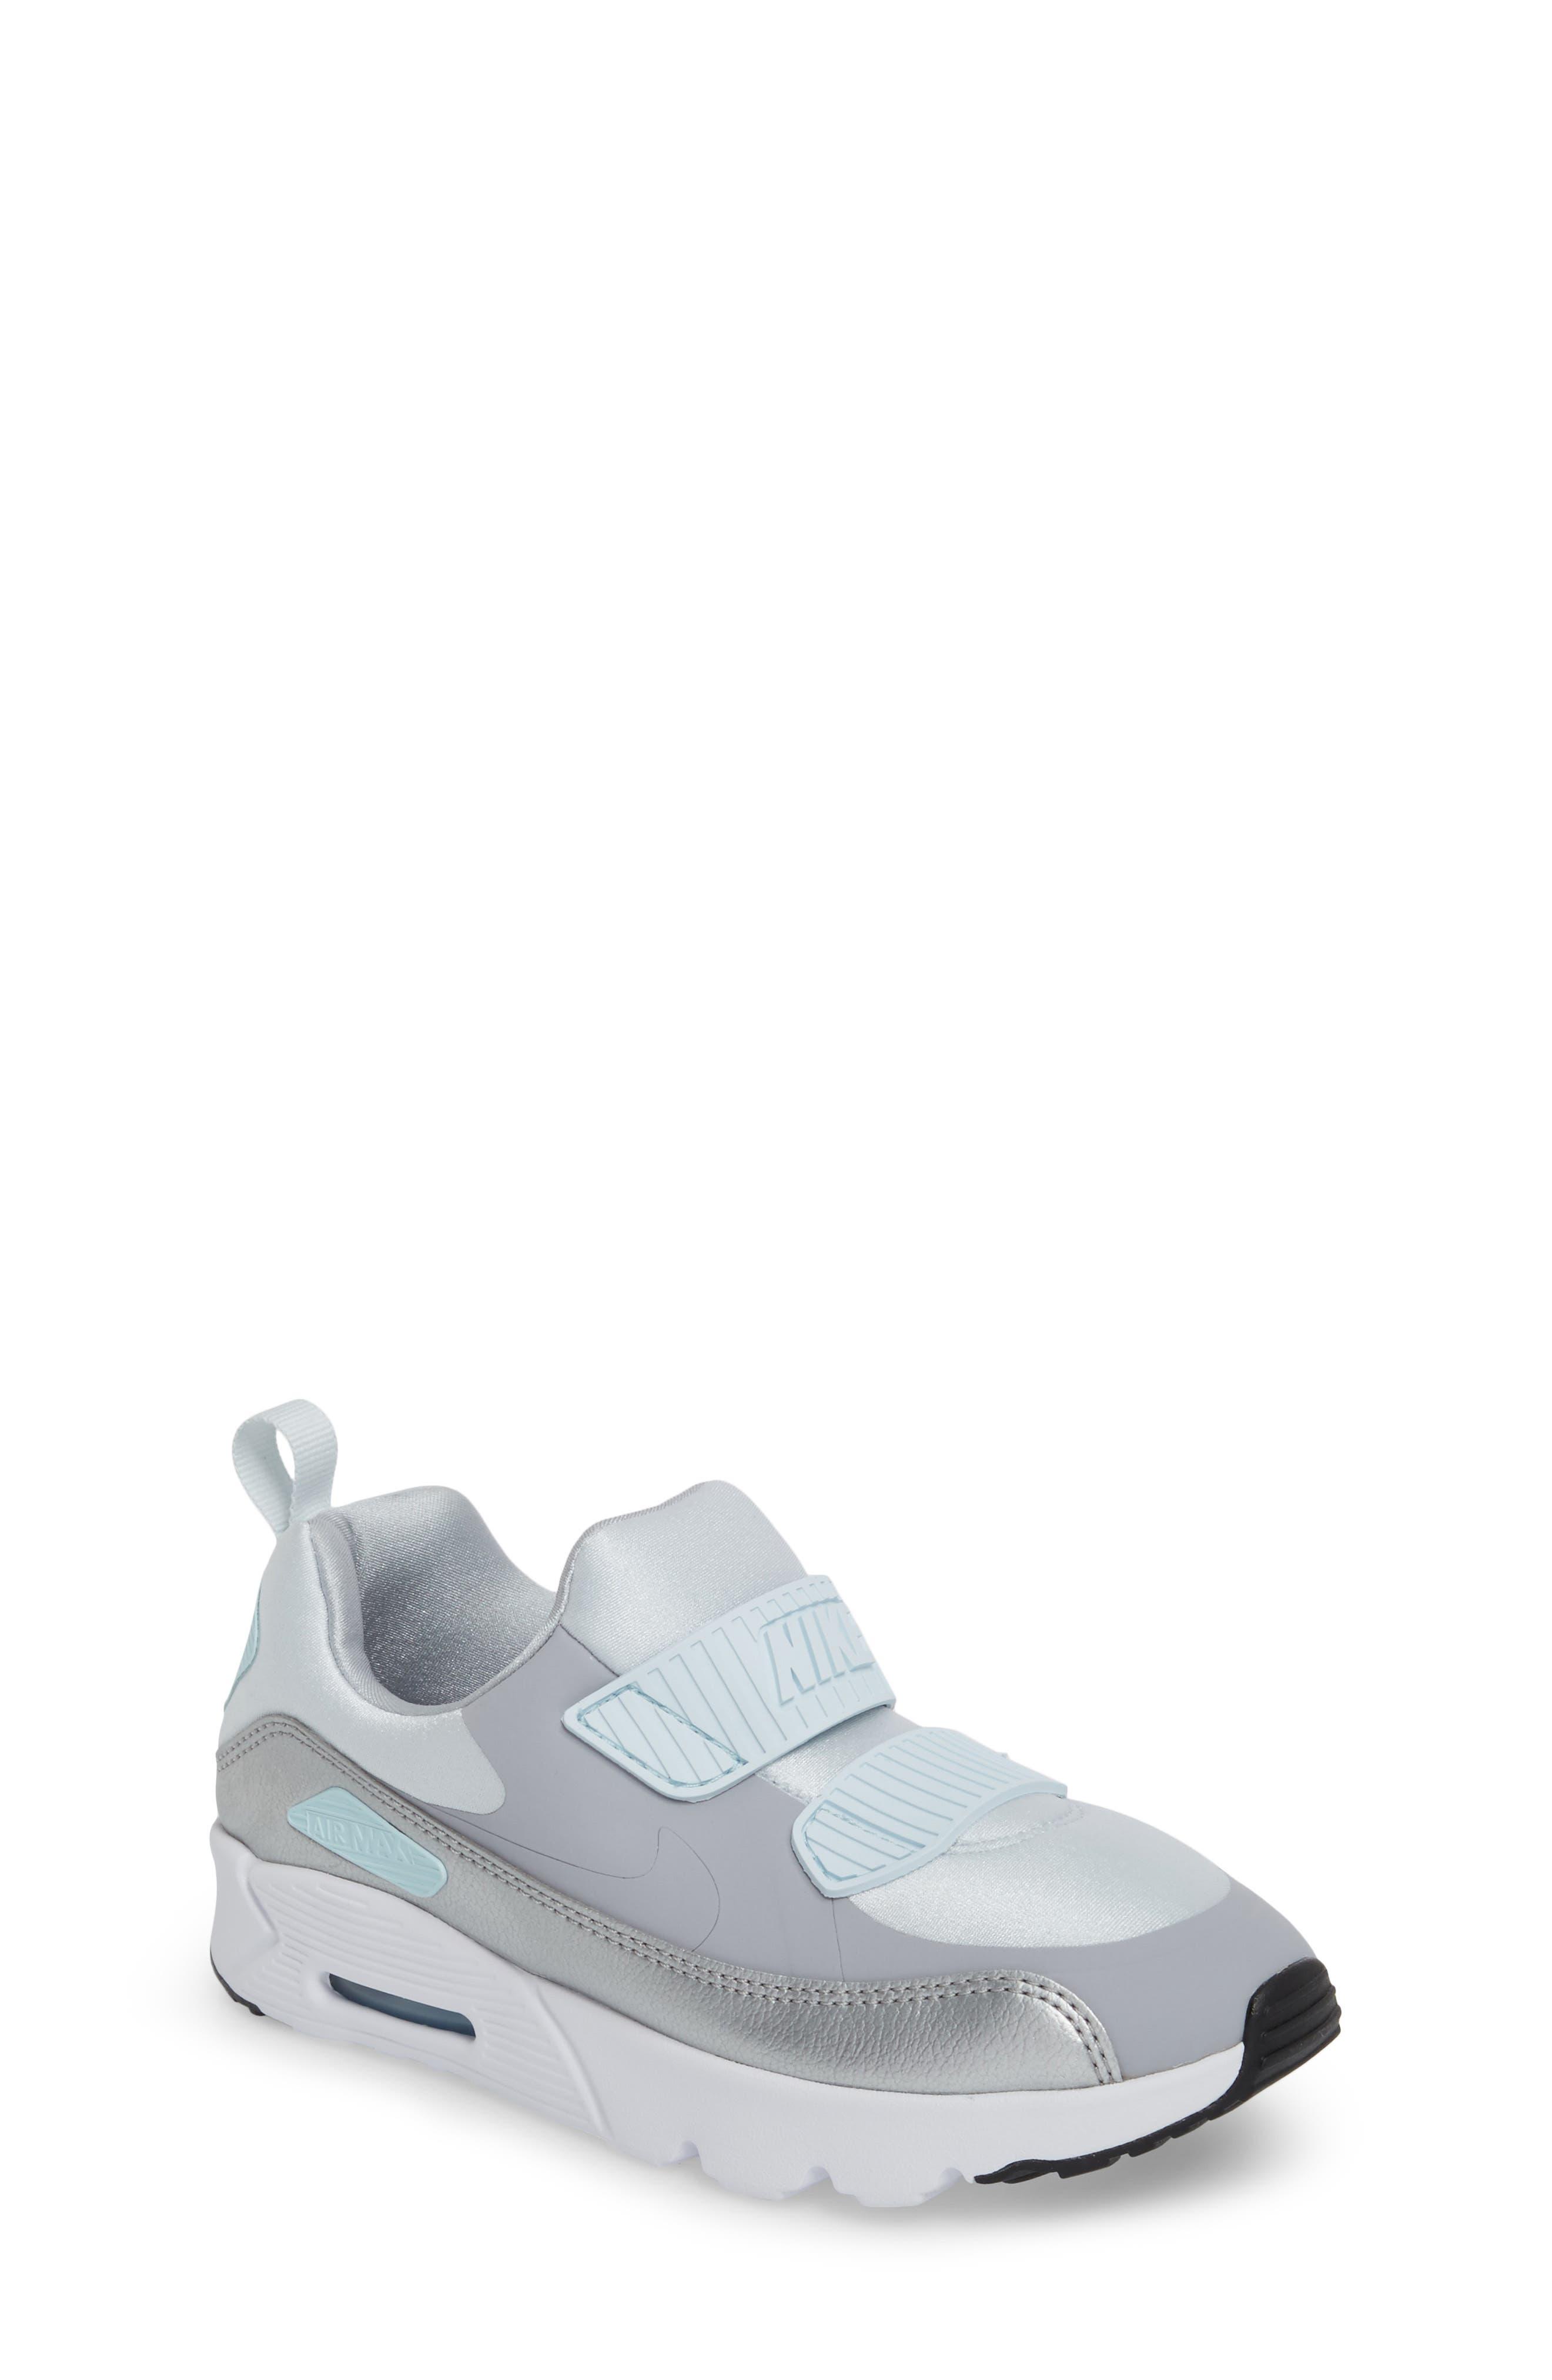 Air Max Tiny 90 Sneaker,                         Main,                         color, Platinum/ Grey/ Silver